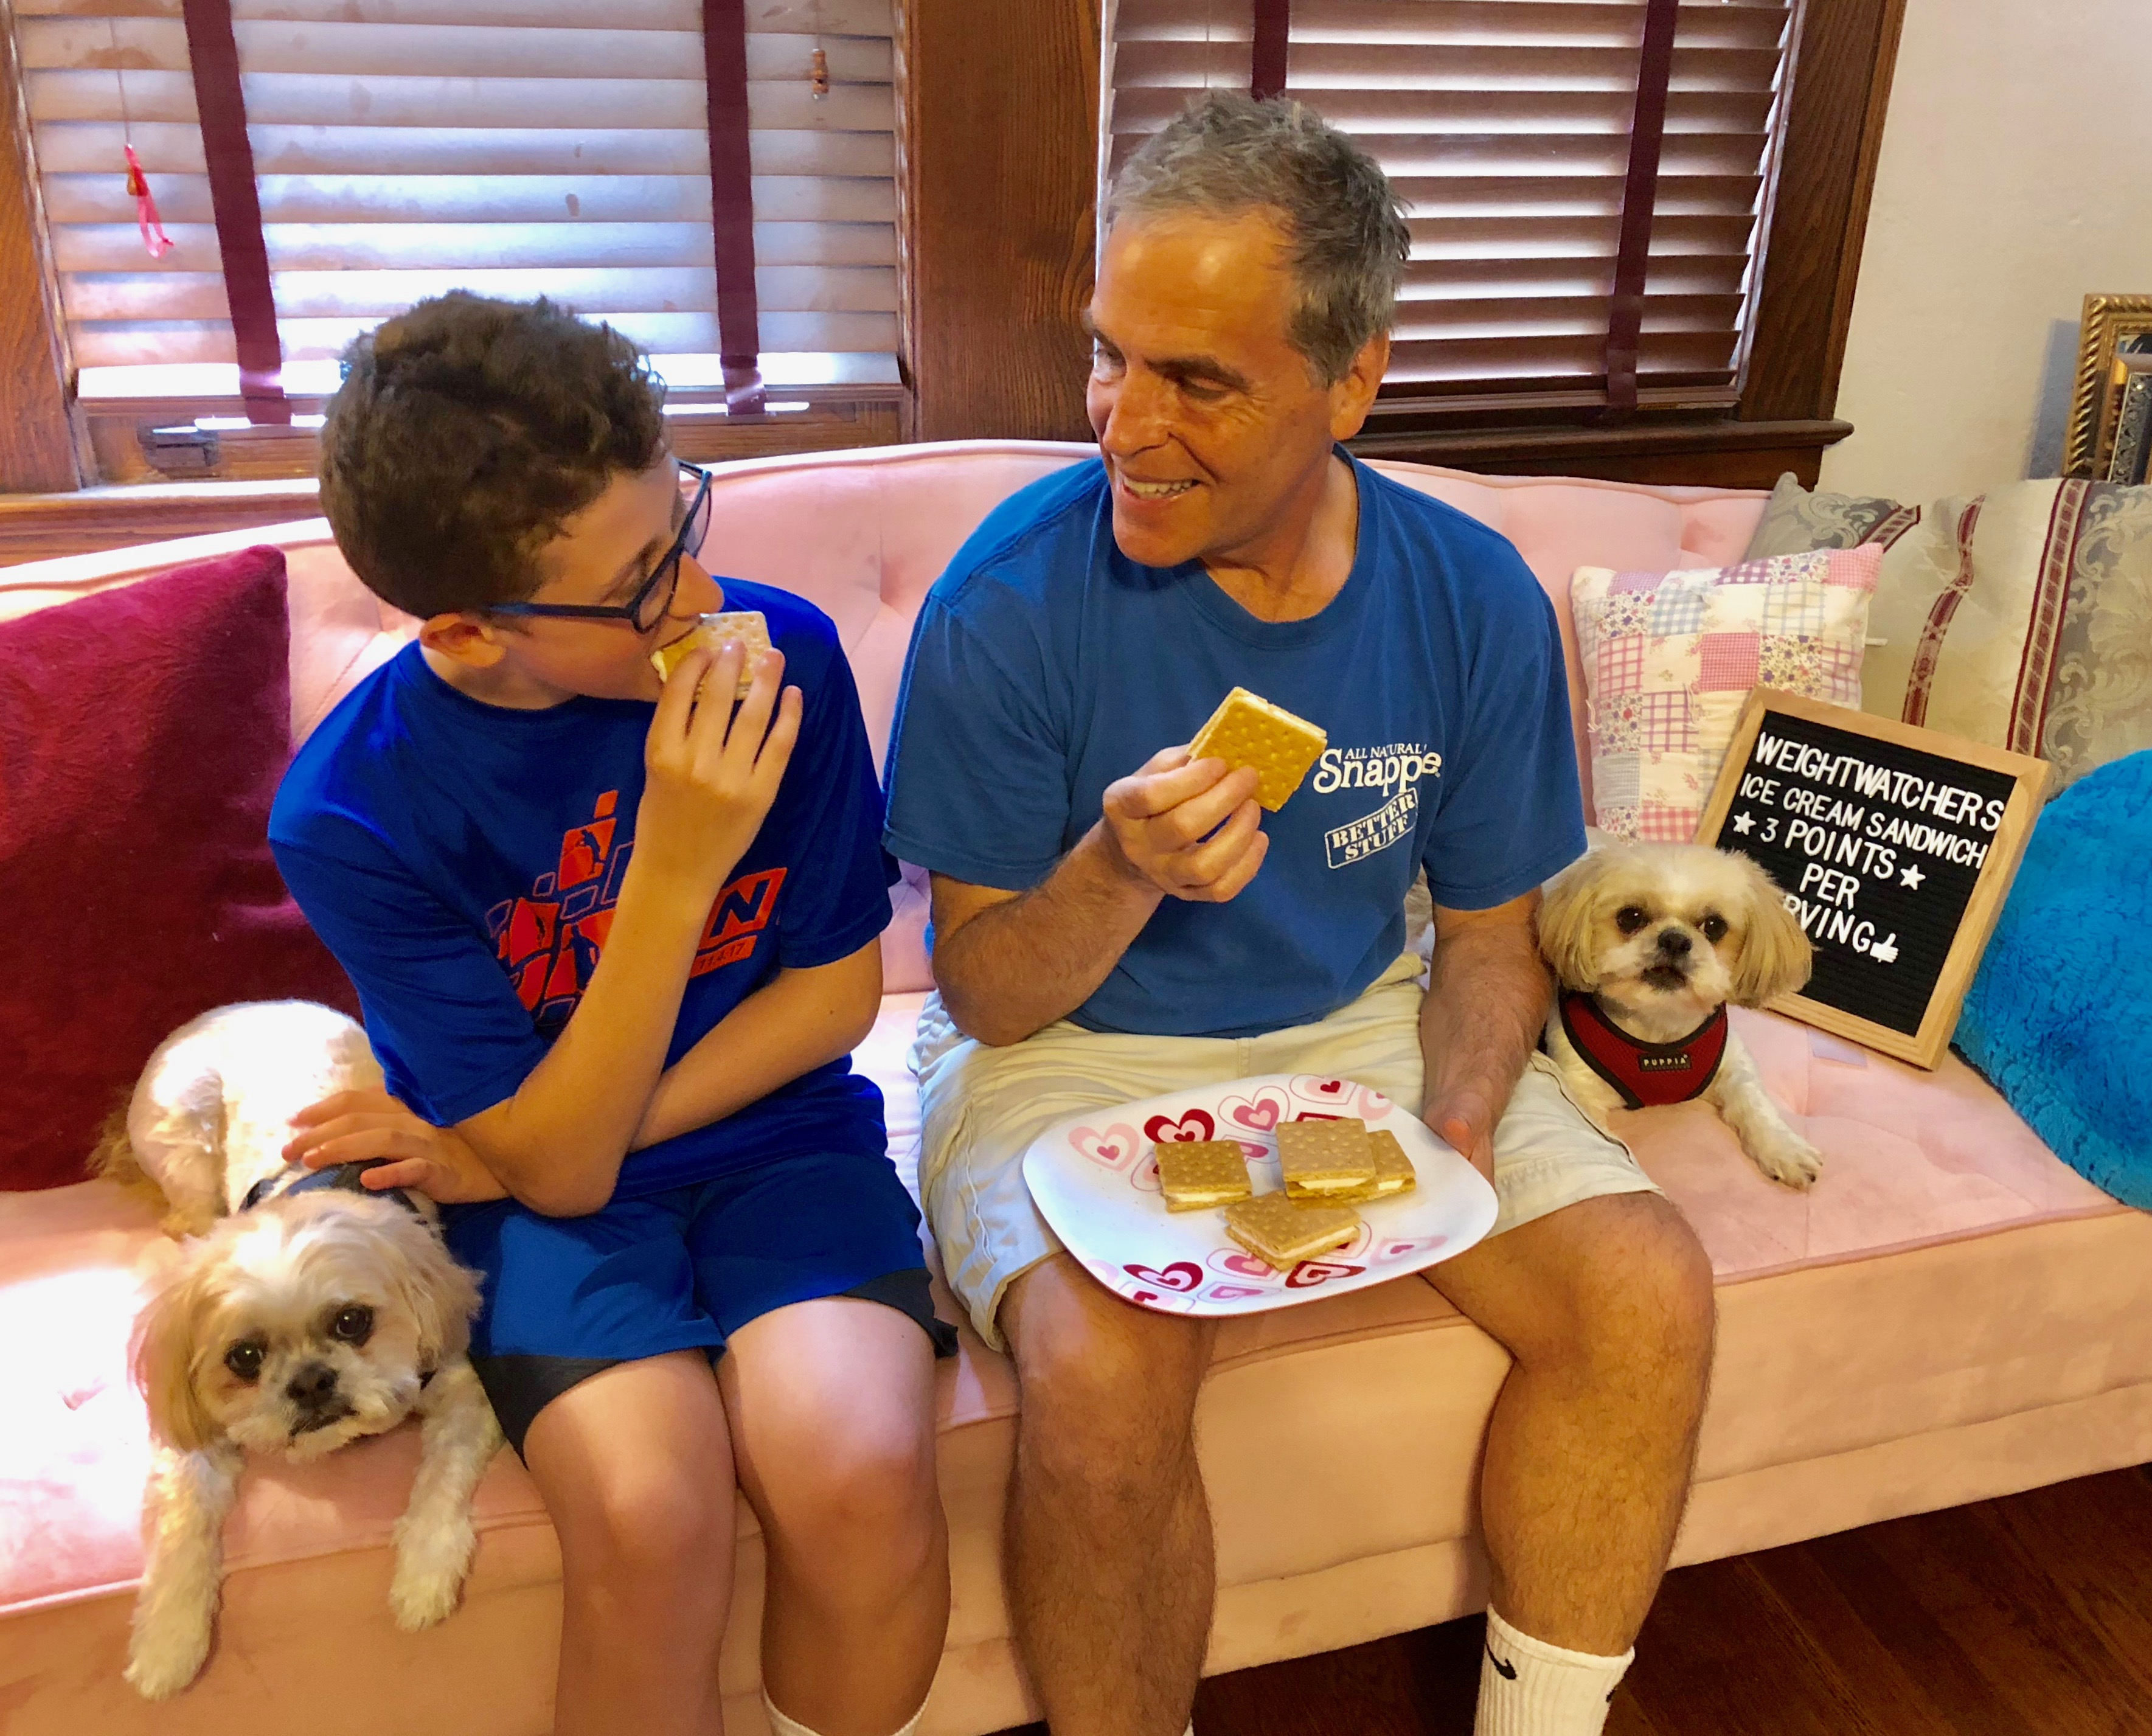 Weight Watchers Faux Ice Cream Sandwich Recipe - Just 3 Smart Points